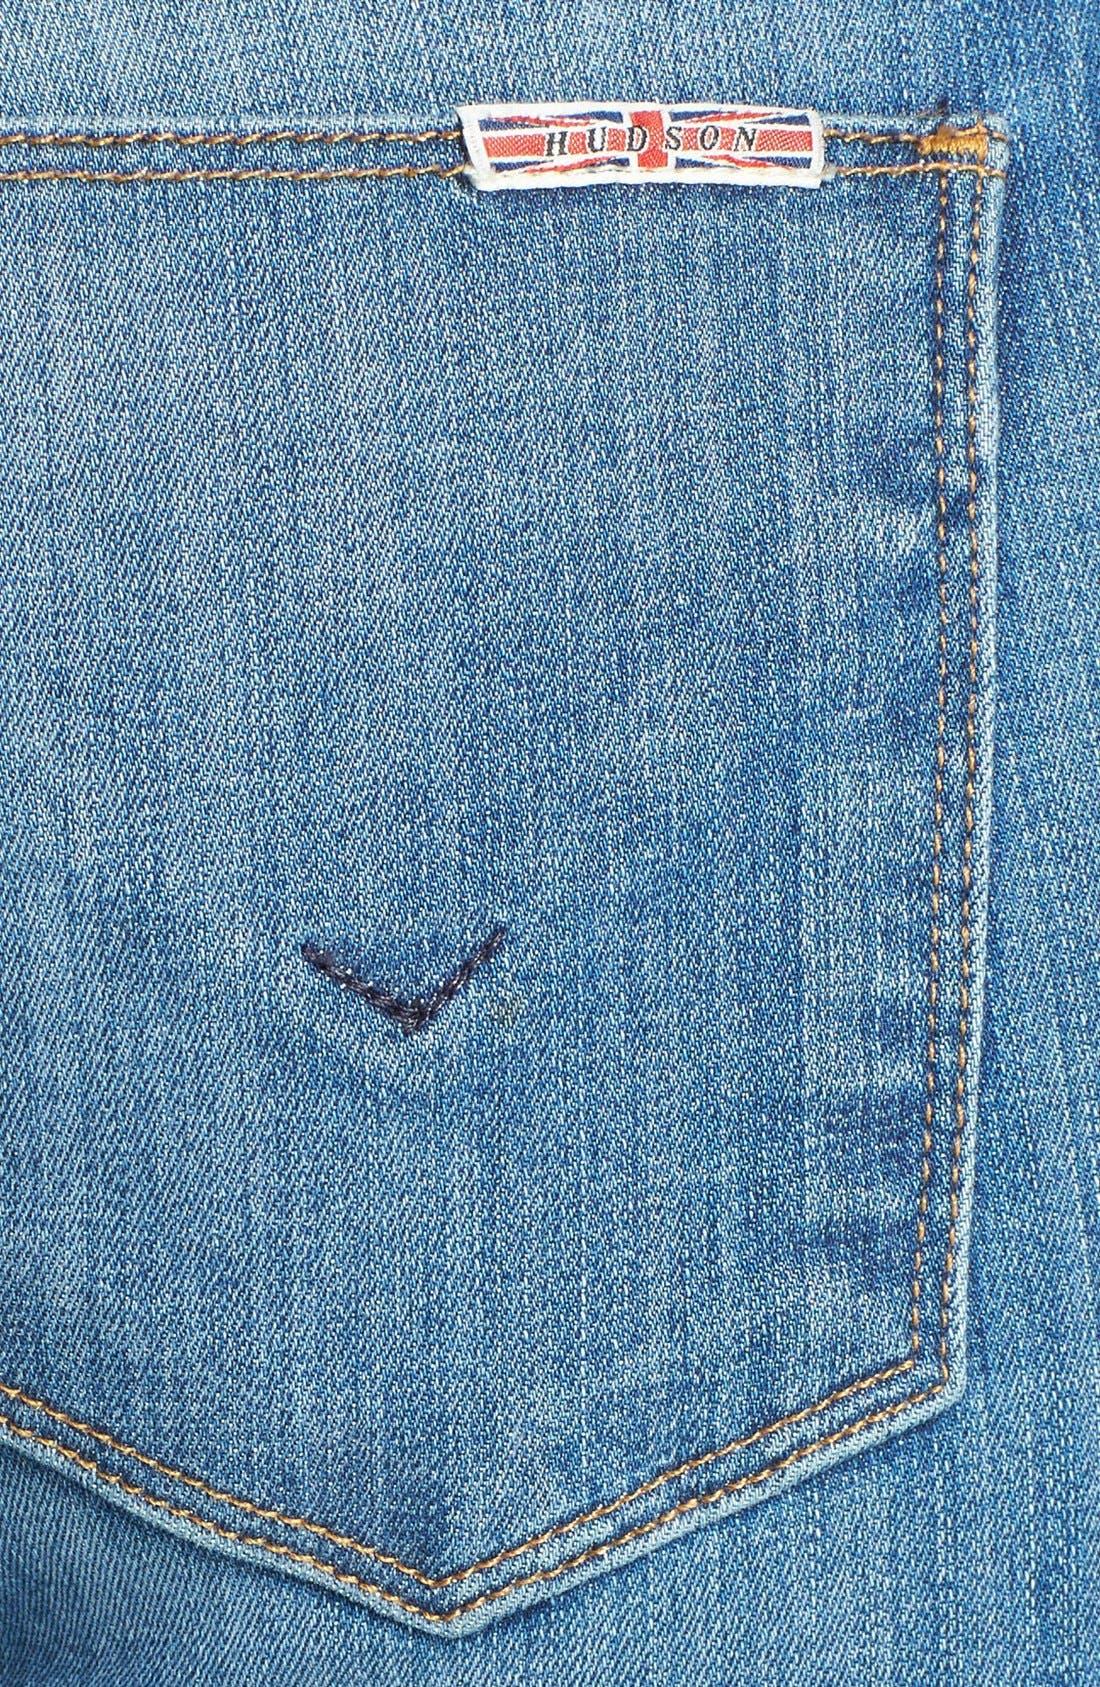 Alternate Image 3  - Hudson Jeans 'Krista' Crop Super Skinny Jeans (Worship Me)